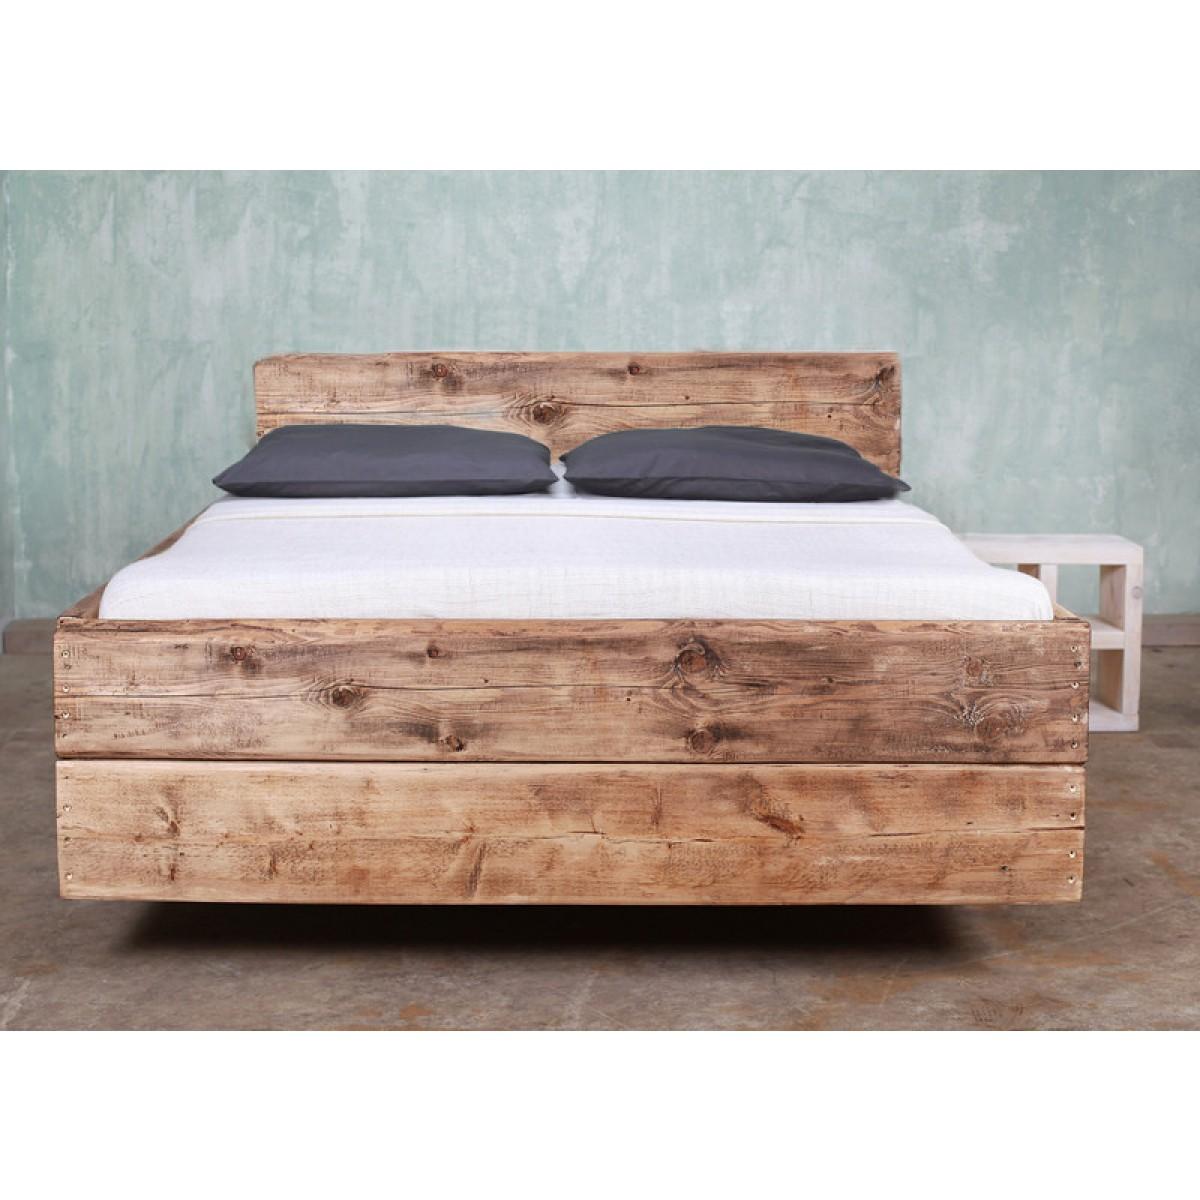 bauholz bett cucuron r ckenlehne. Black Bedroom Furniture Sets. Home Design Ideas